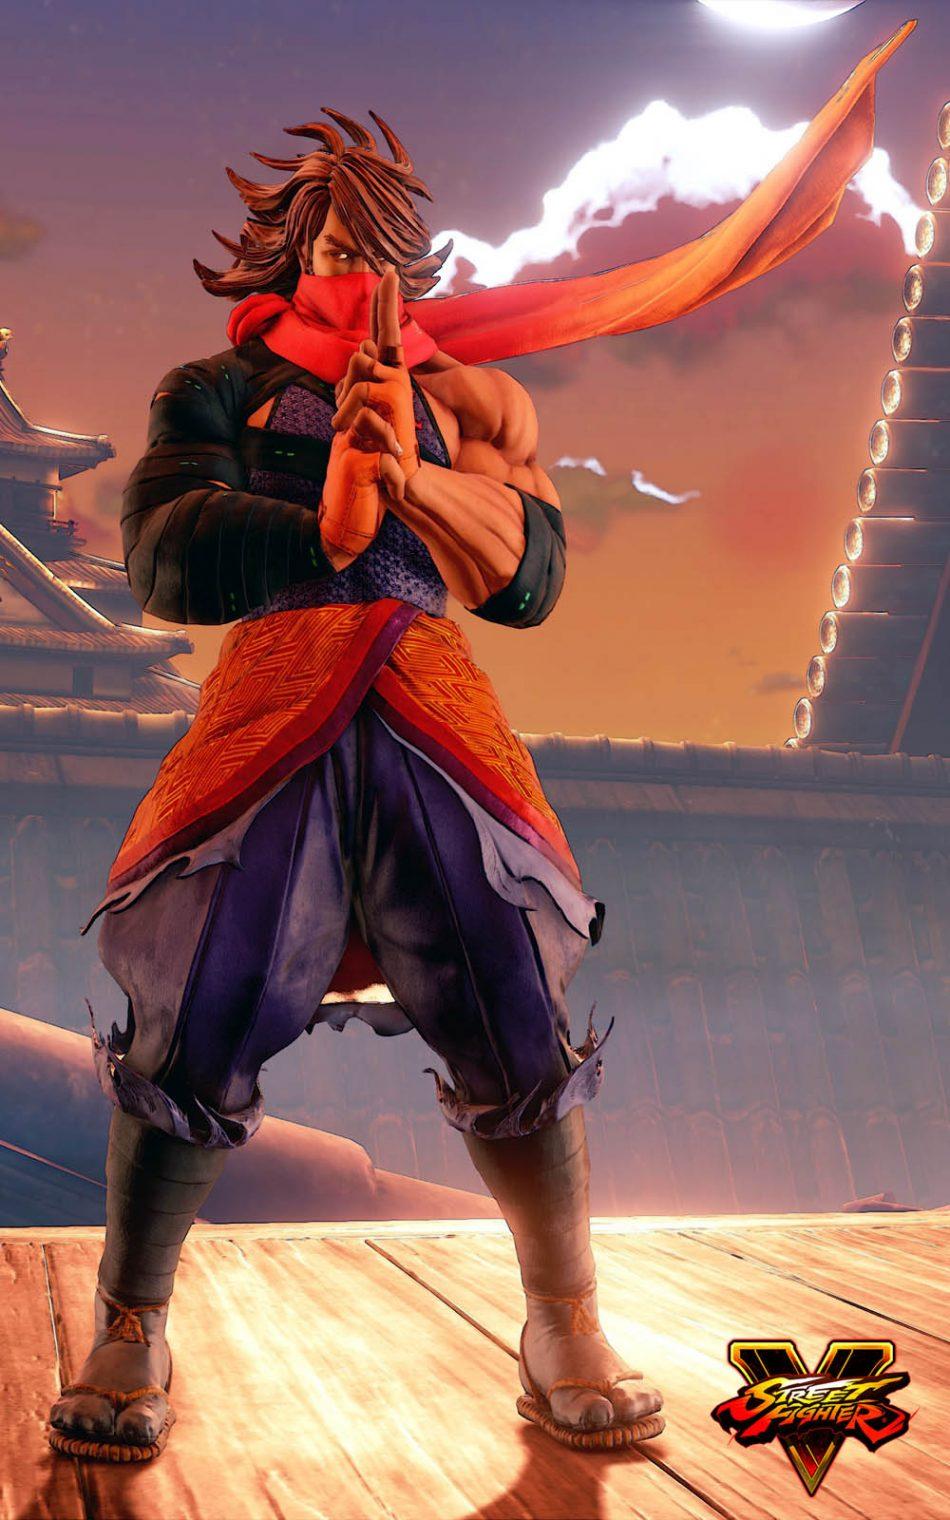 Download Zeku Street Fighter 5 Hero Free Pure 4k Ultra Hd Mobile